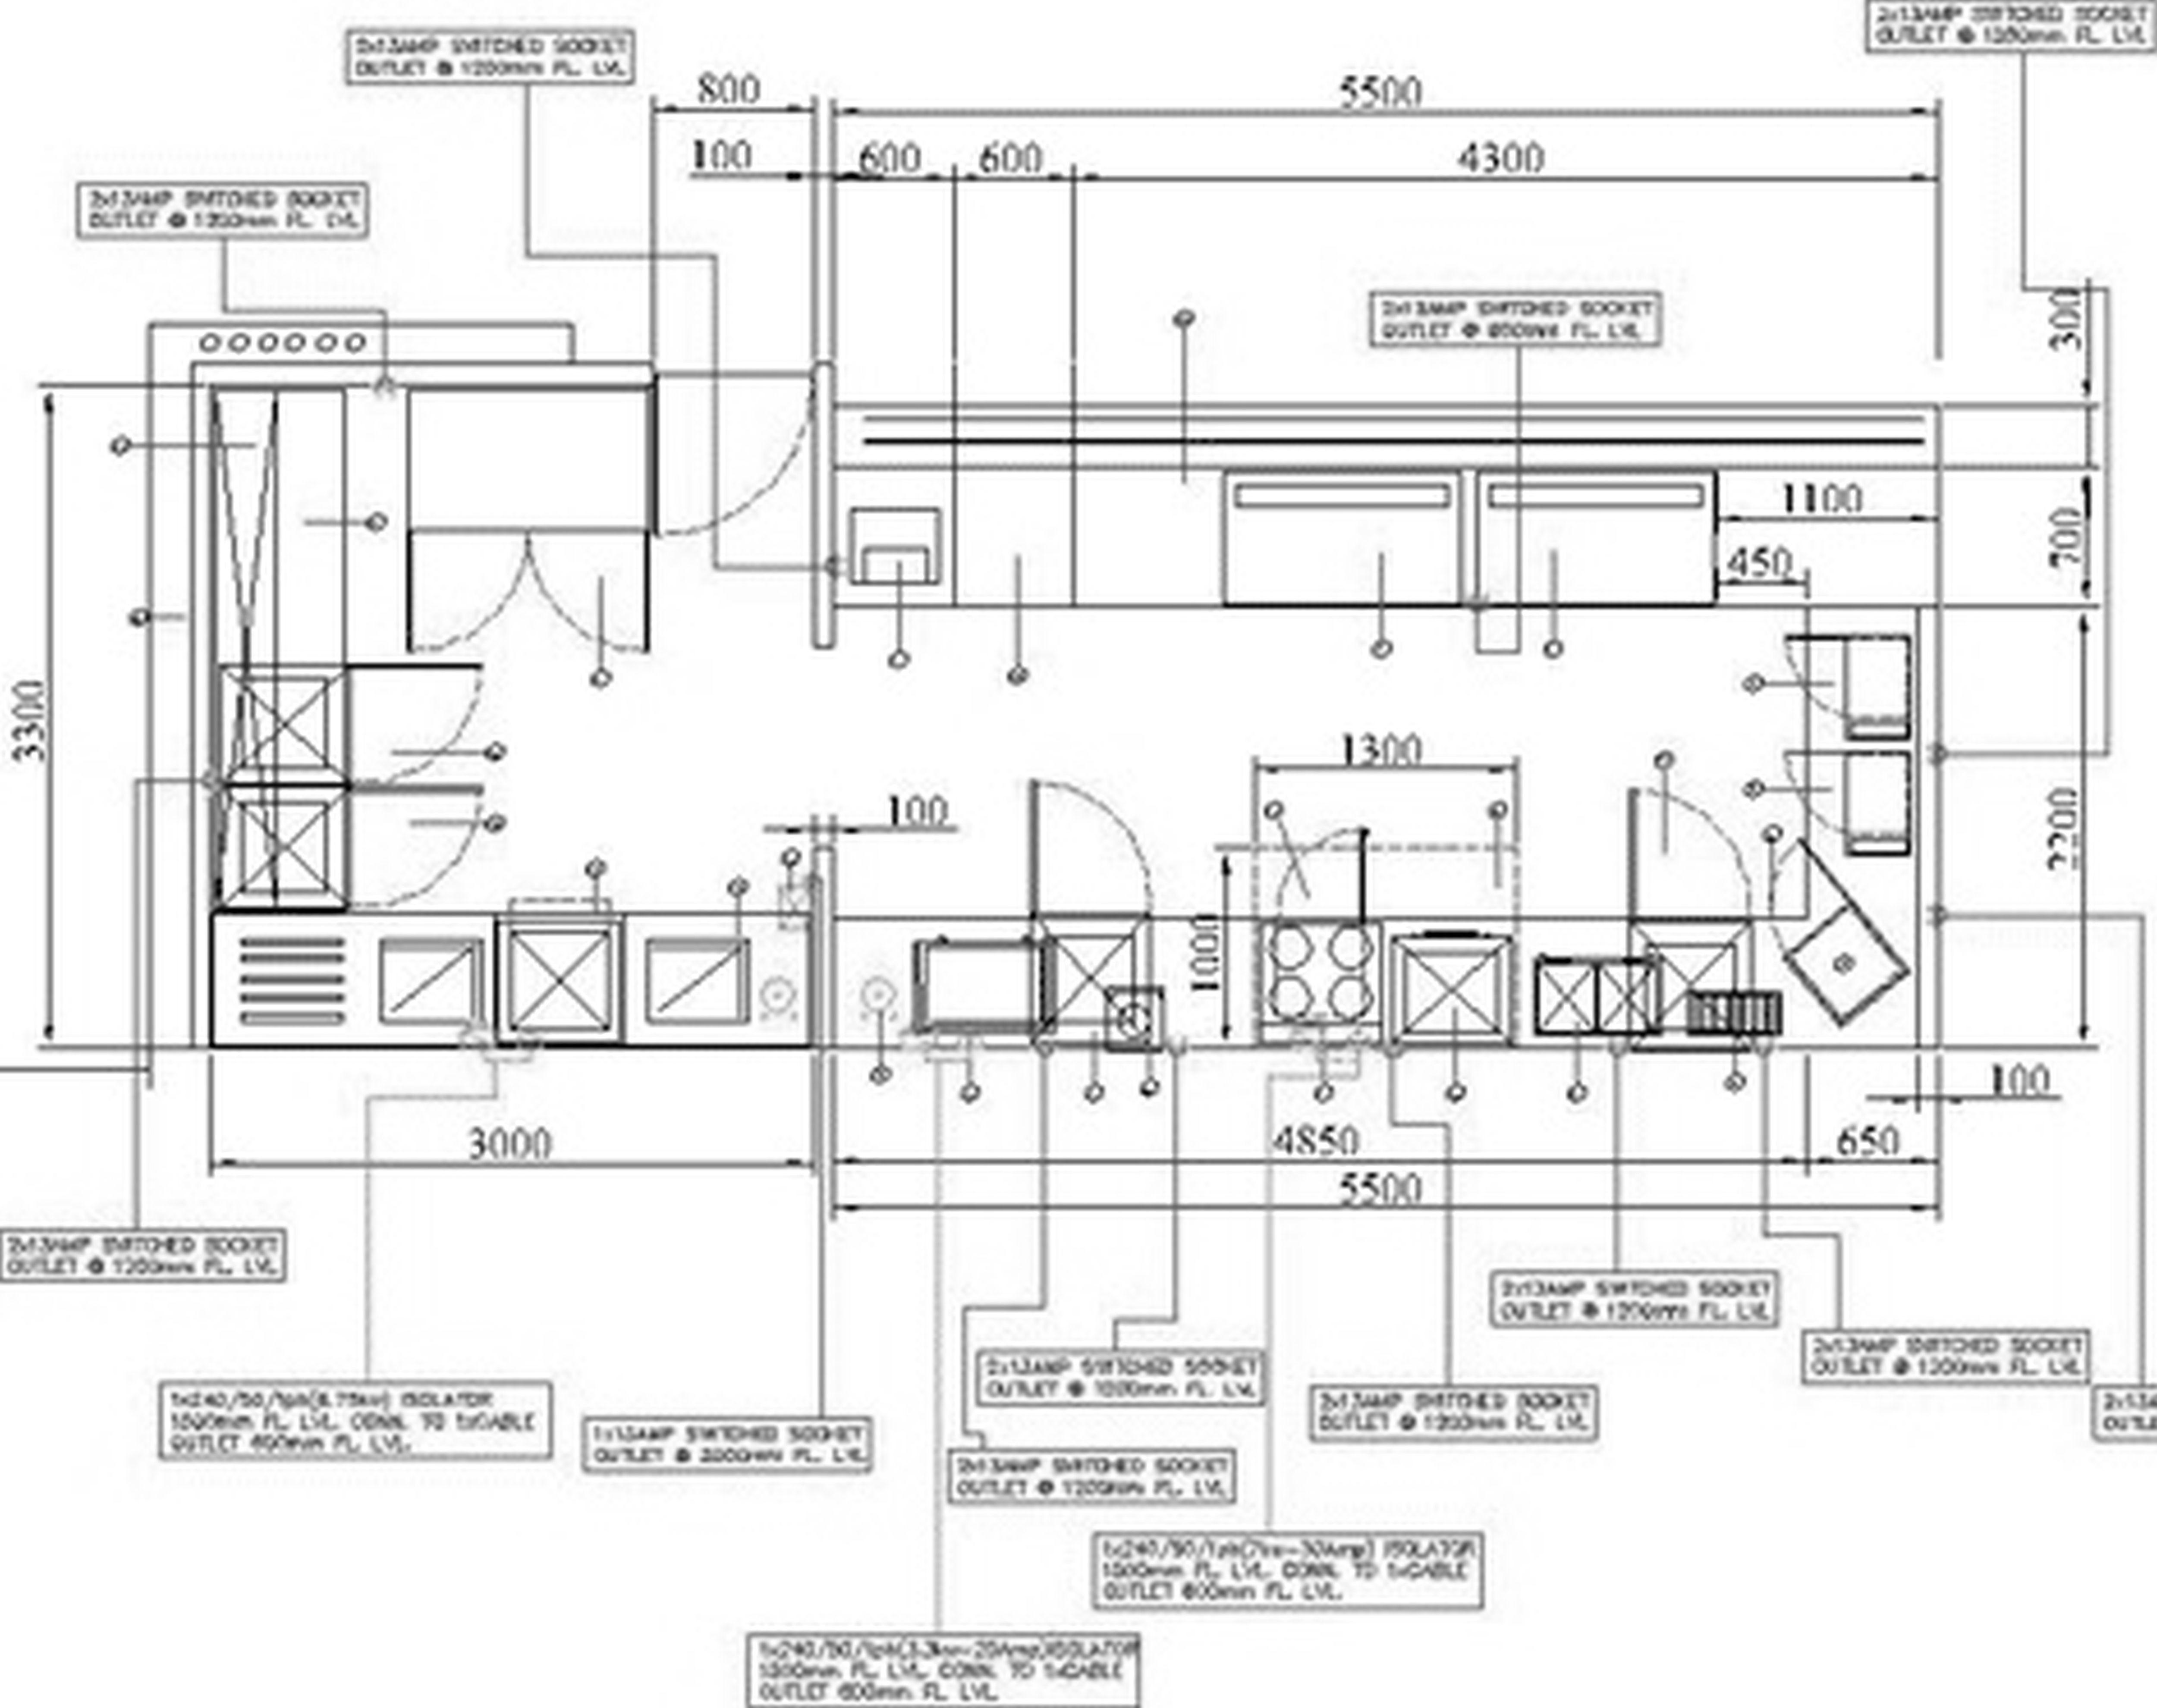 kitchen layout design High Quality Threshold Kitchen Island 1 Commercial Kitchen Design Layout